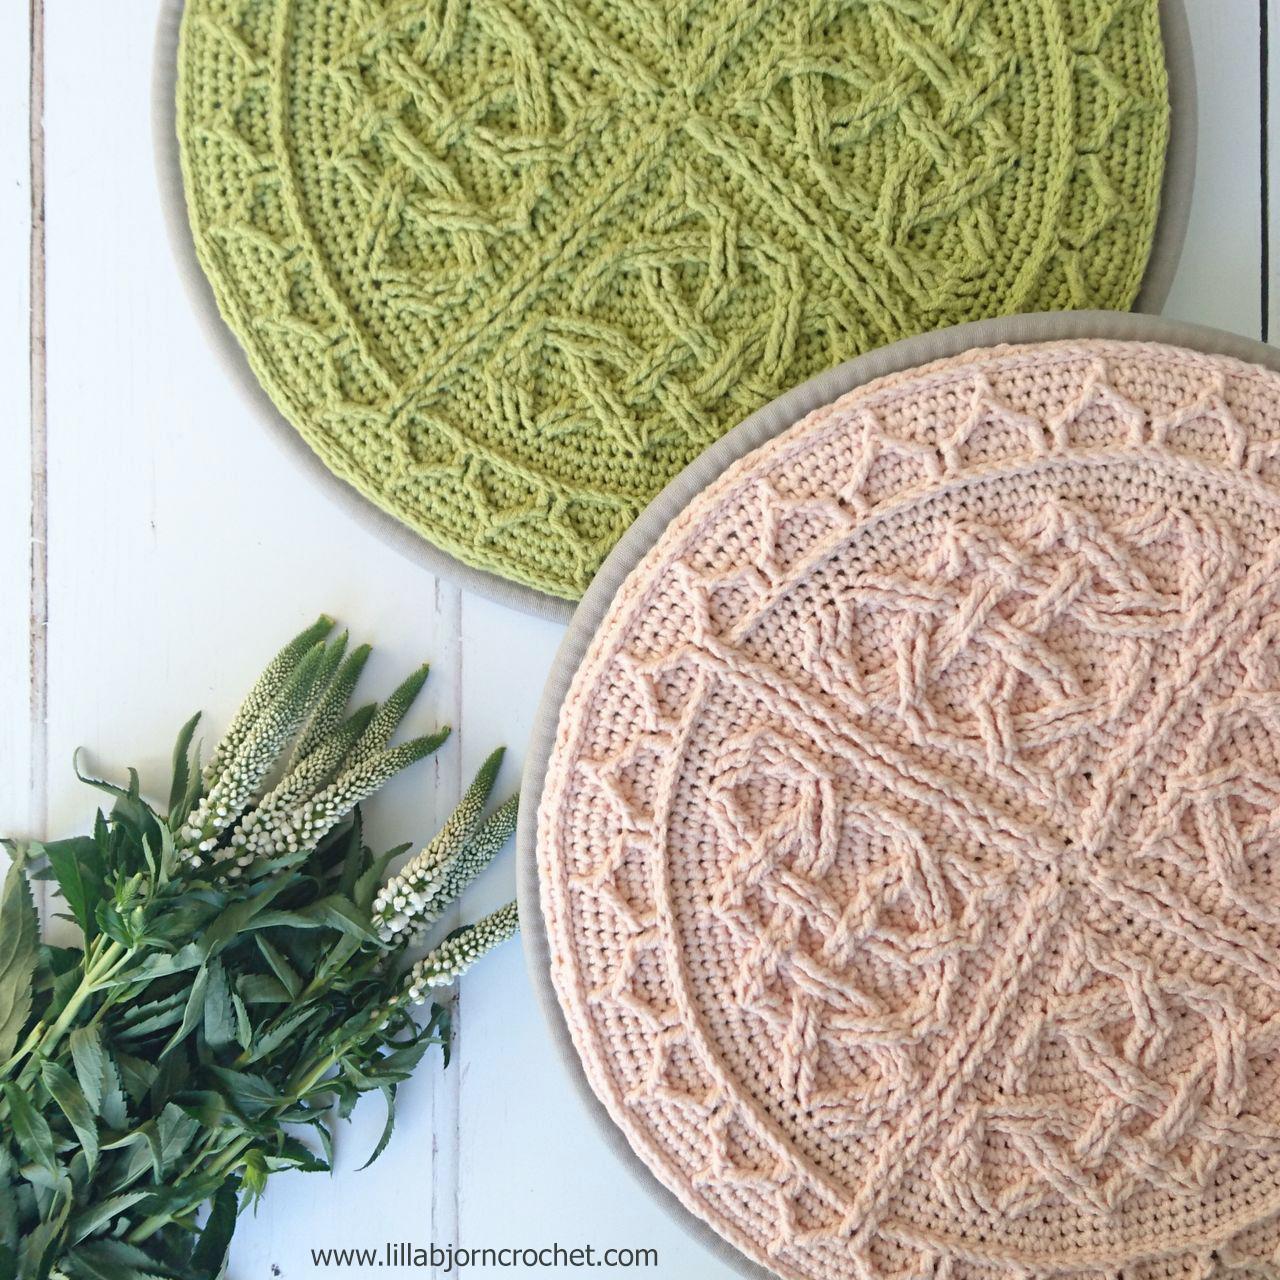 Celtic Cabled Mandala: overlay crochet pattern by Lilla Bjorn